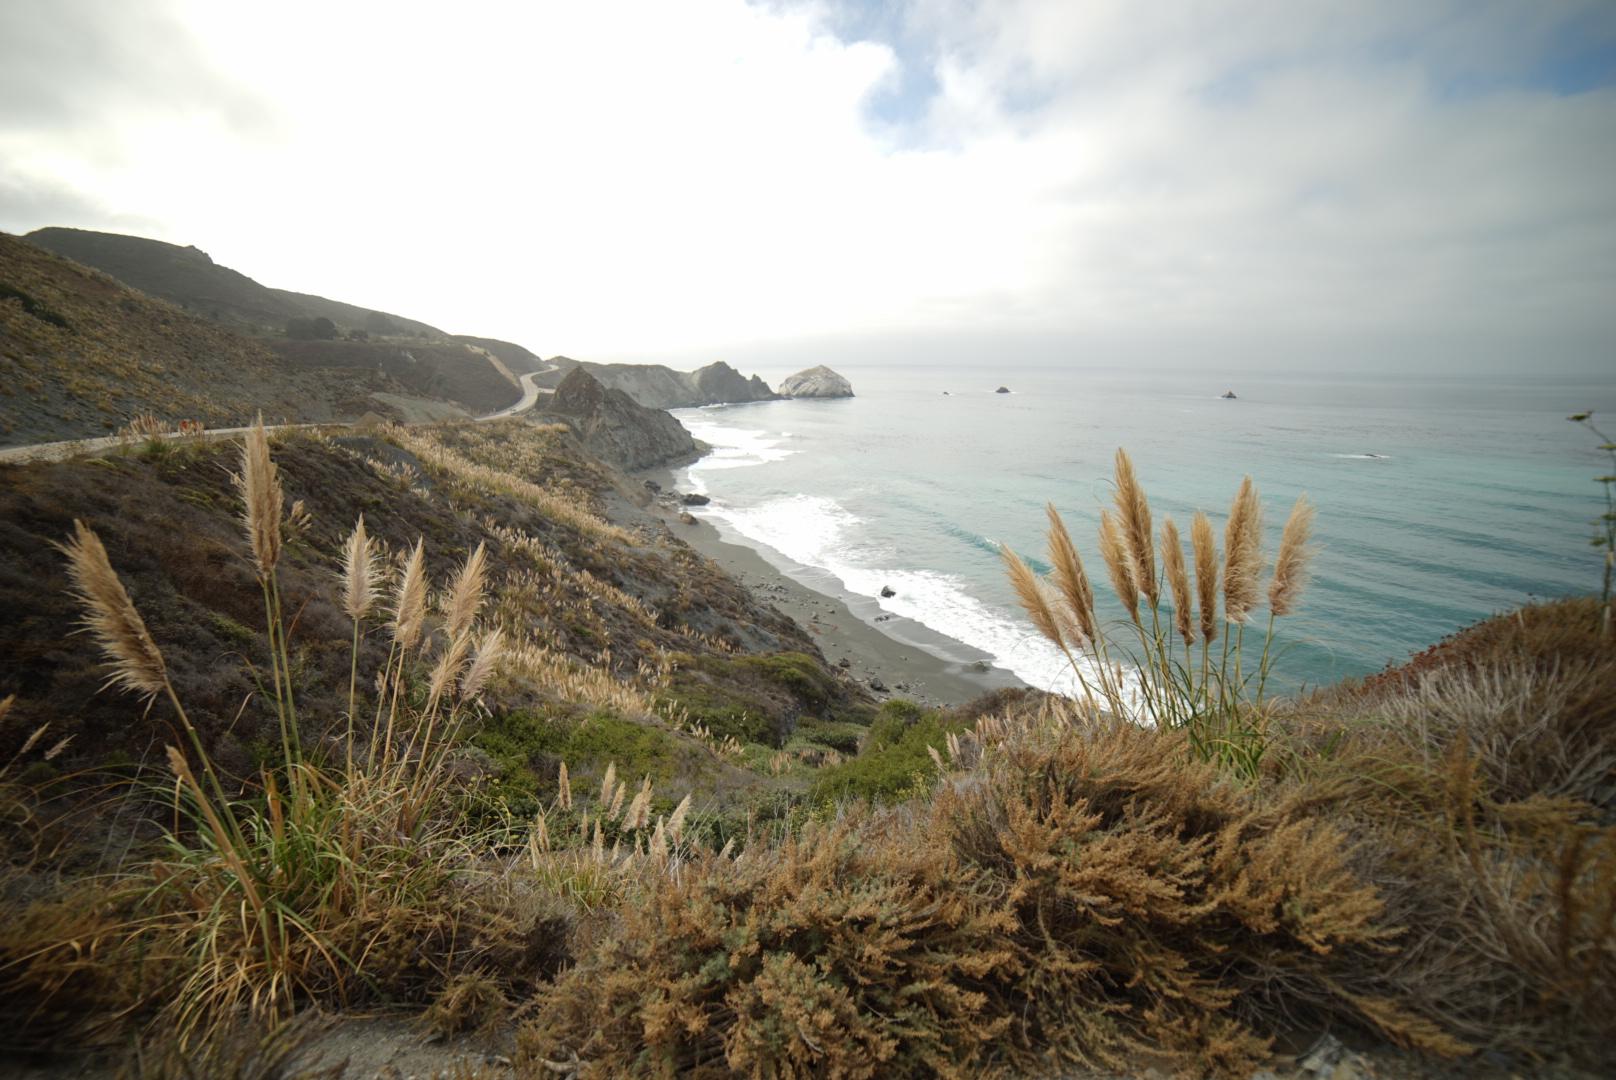 Behold, the California coast...